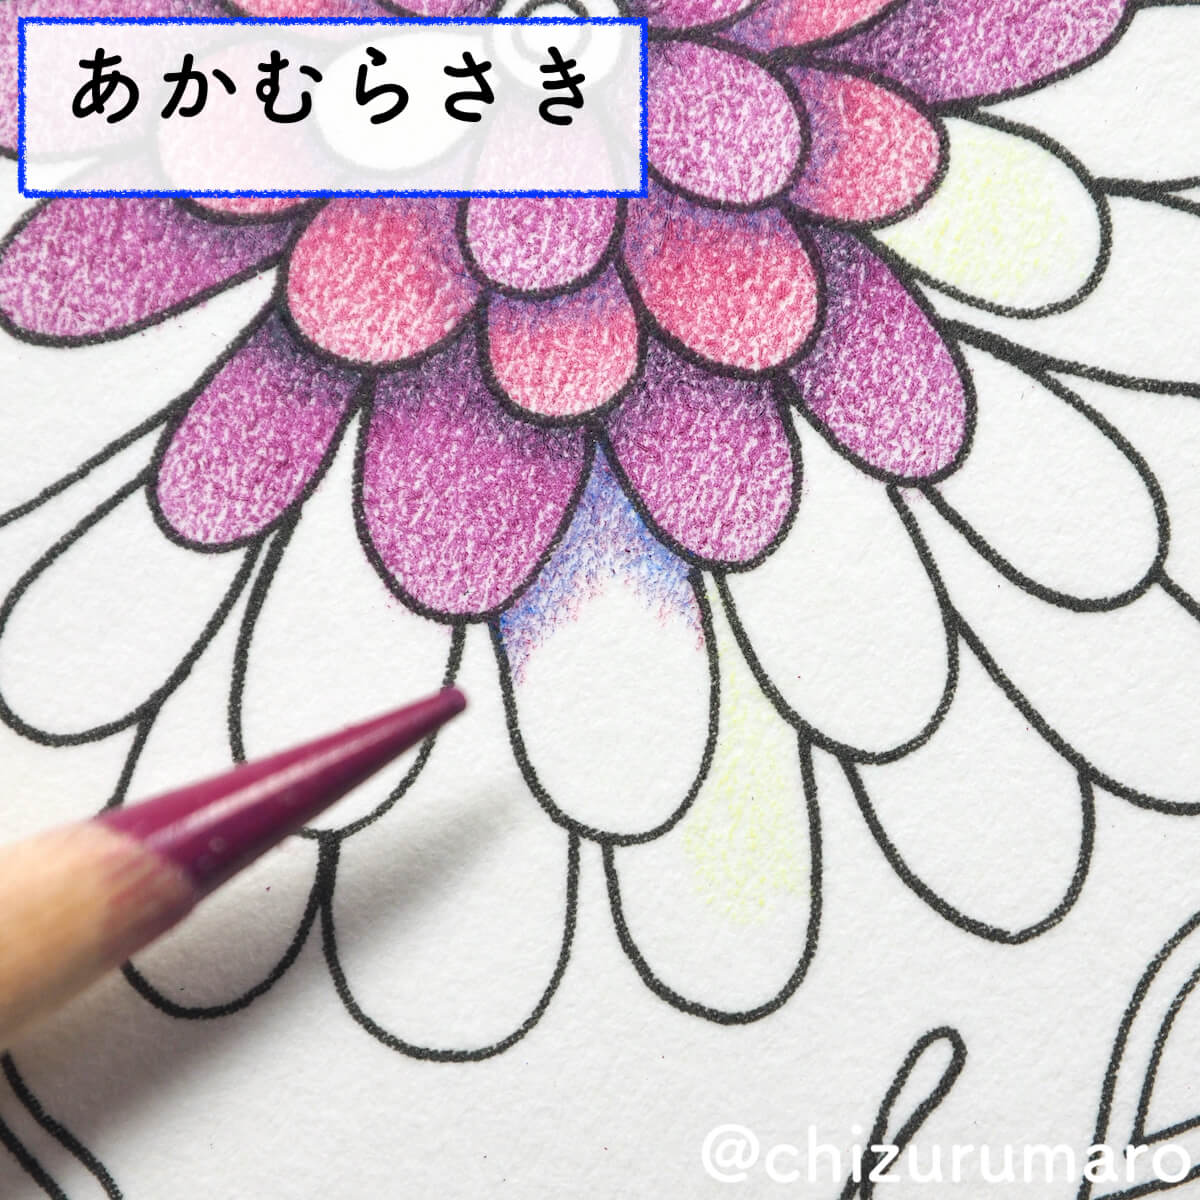 f:id:chizurumaro:20200415164058j:plain